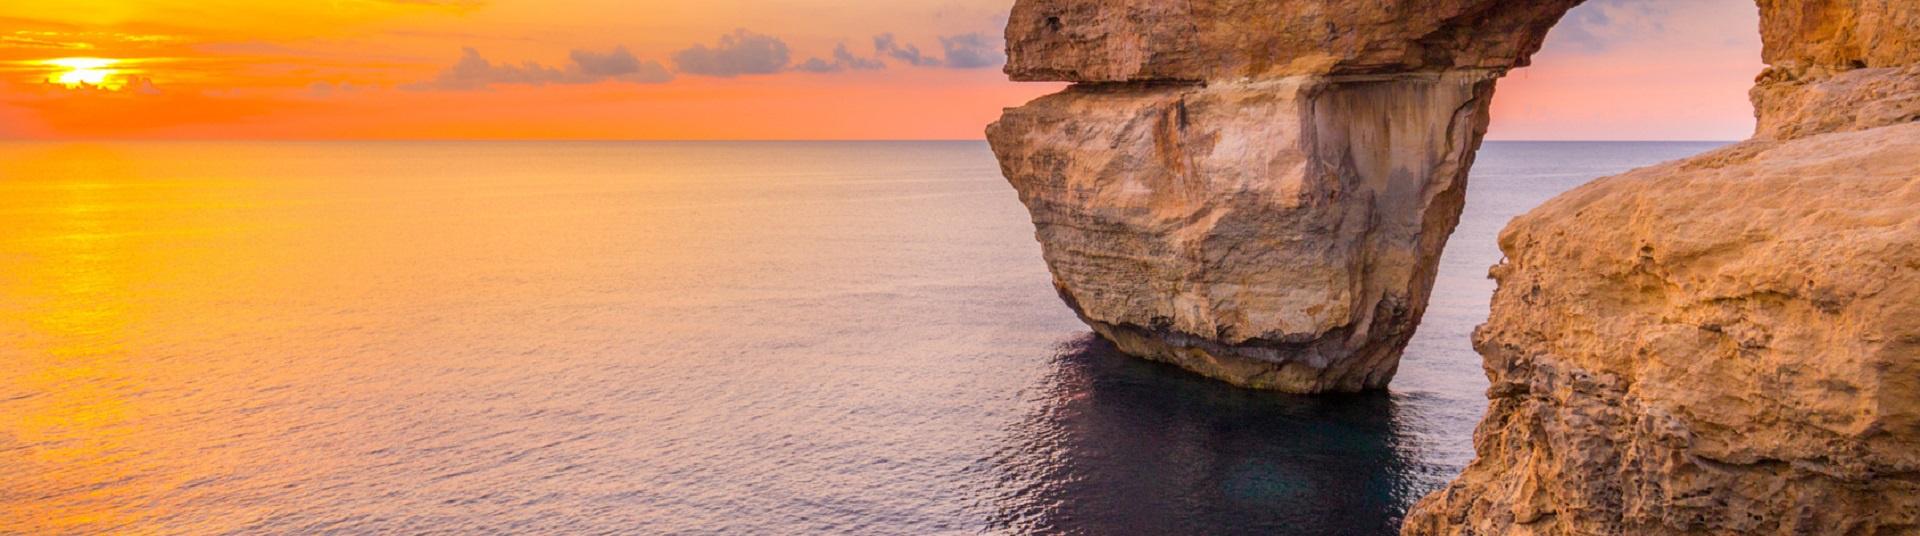 Week-end pas cher Malte